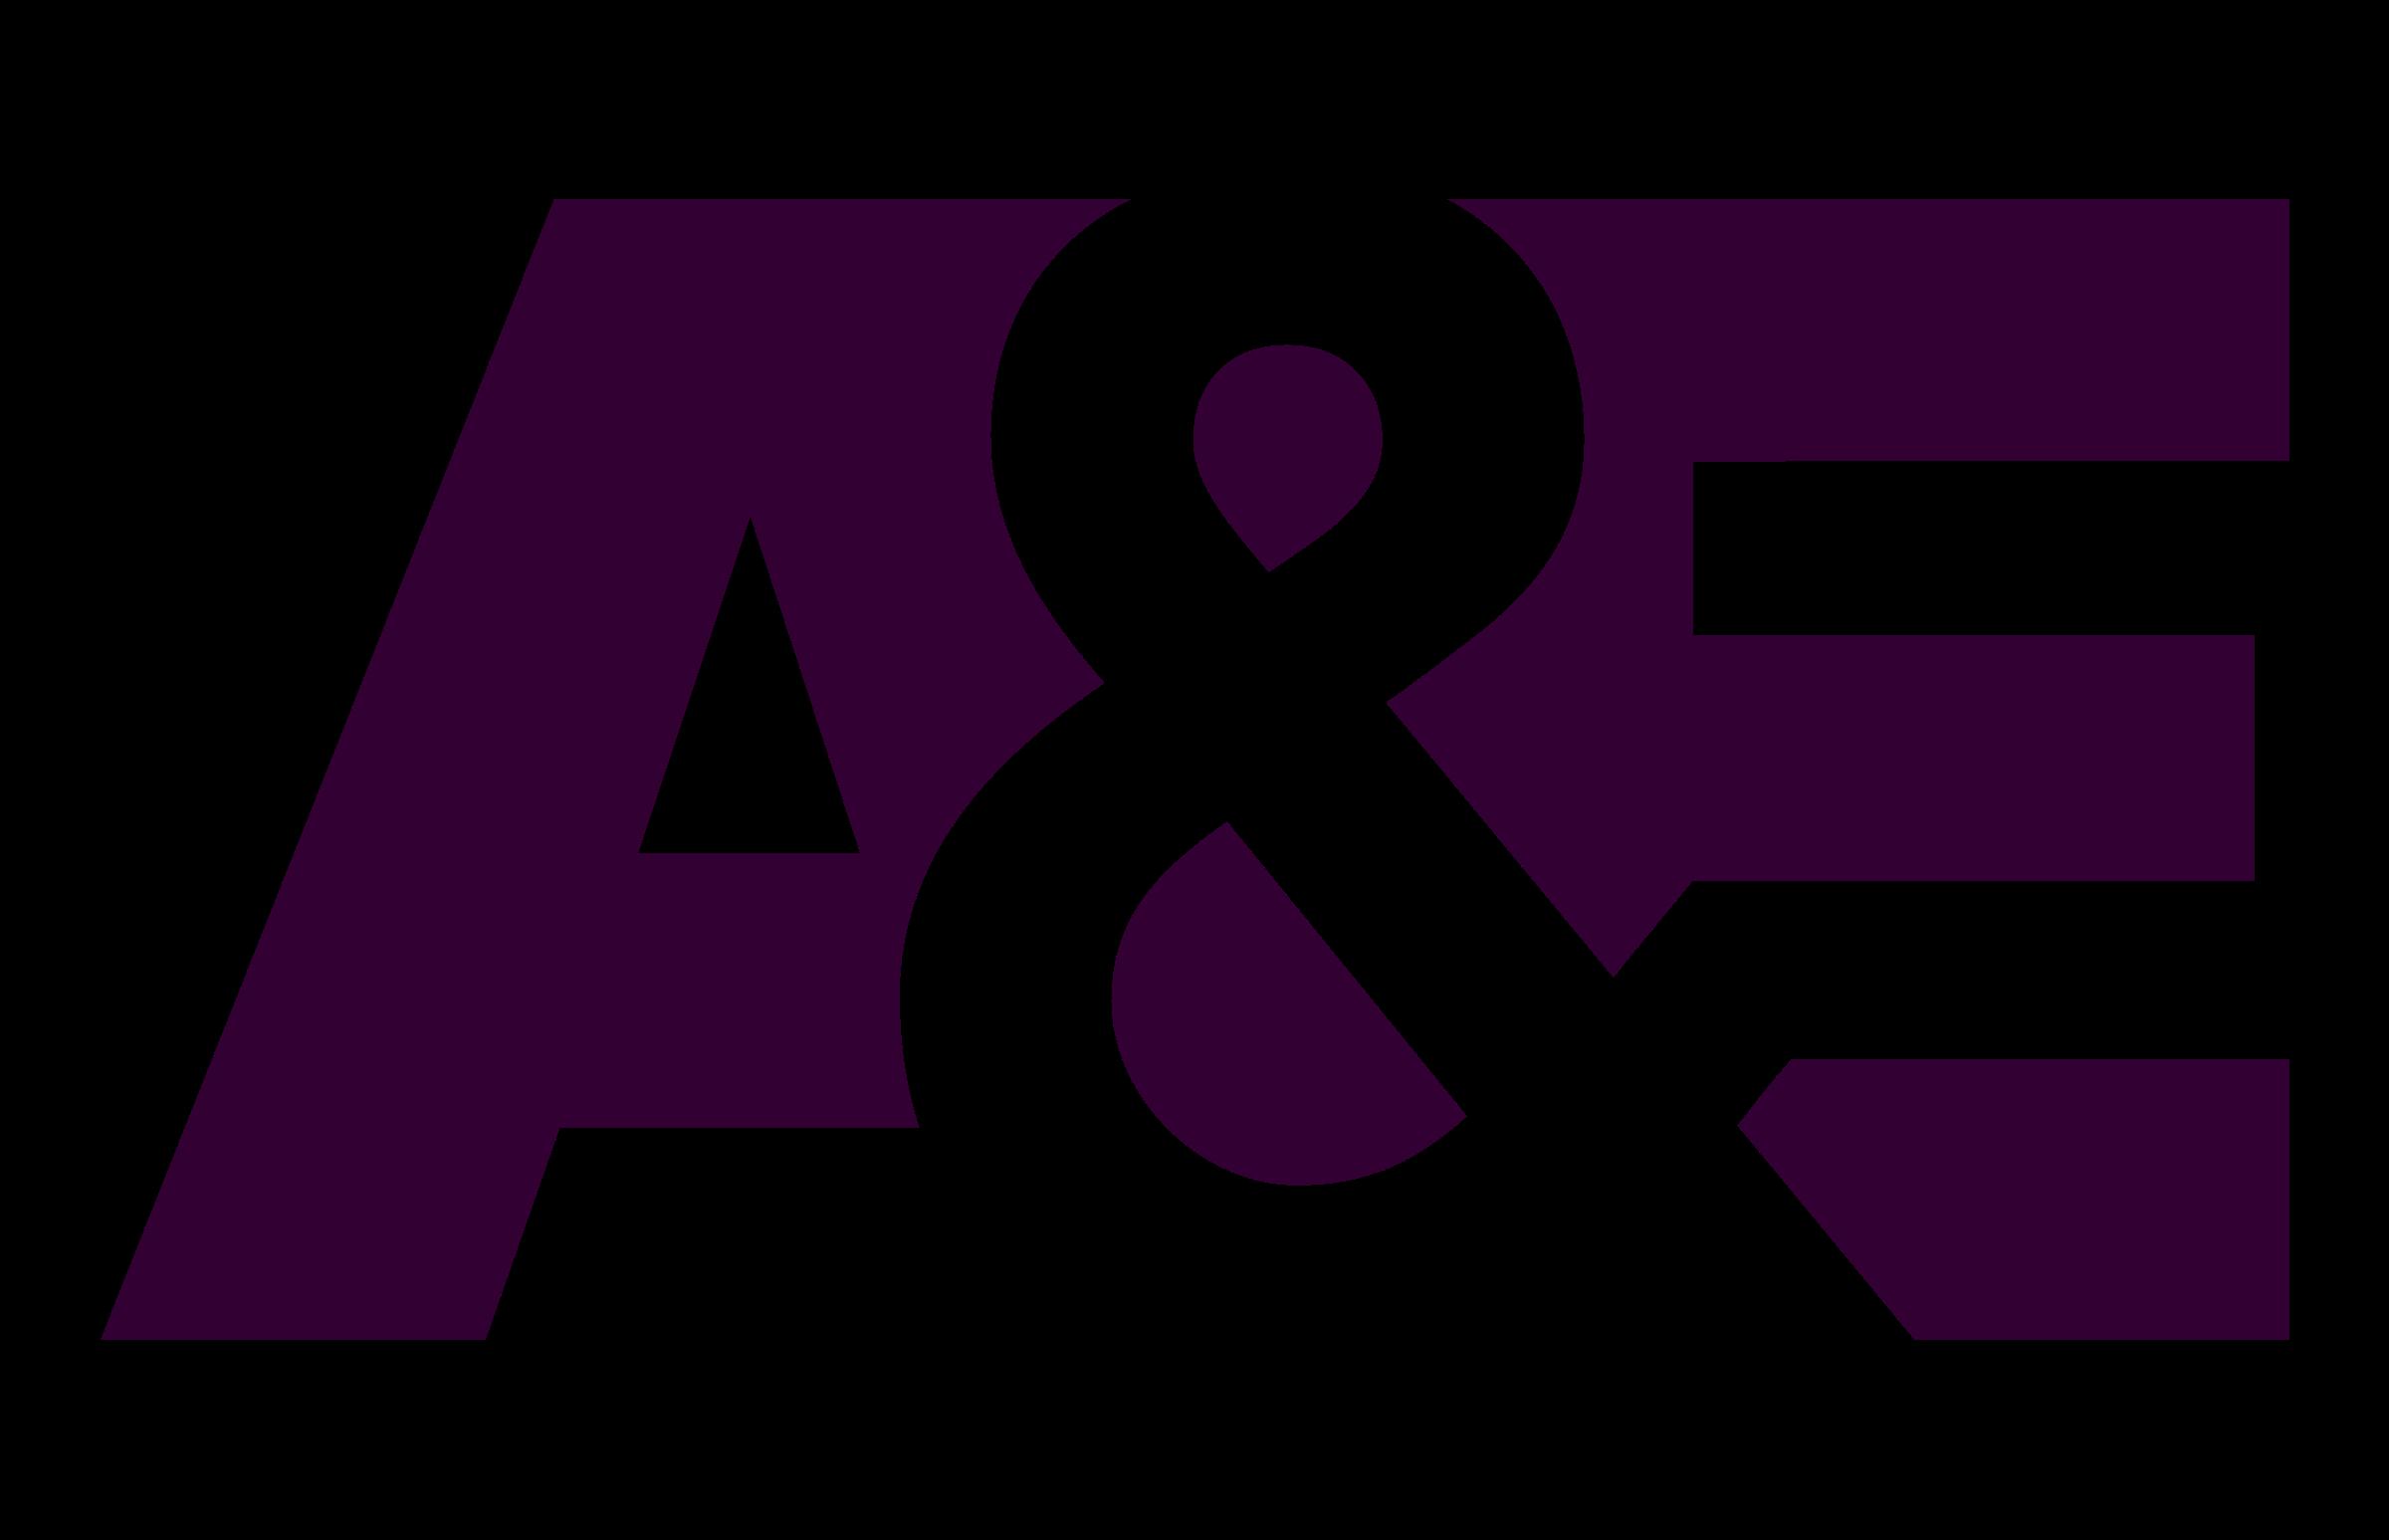 Image Result For A E Logo Logos Letters Symbols